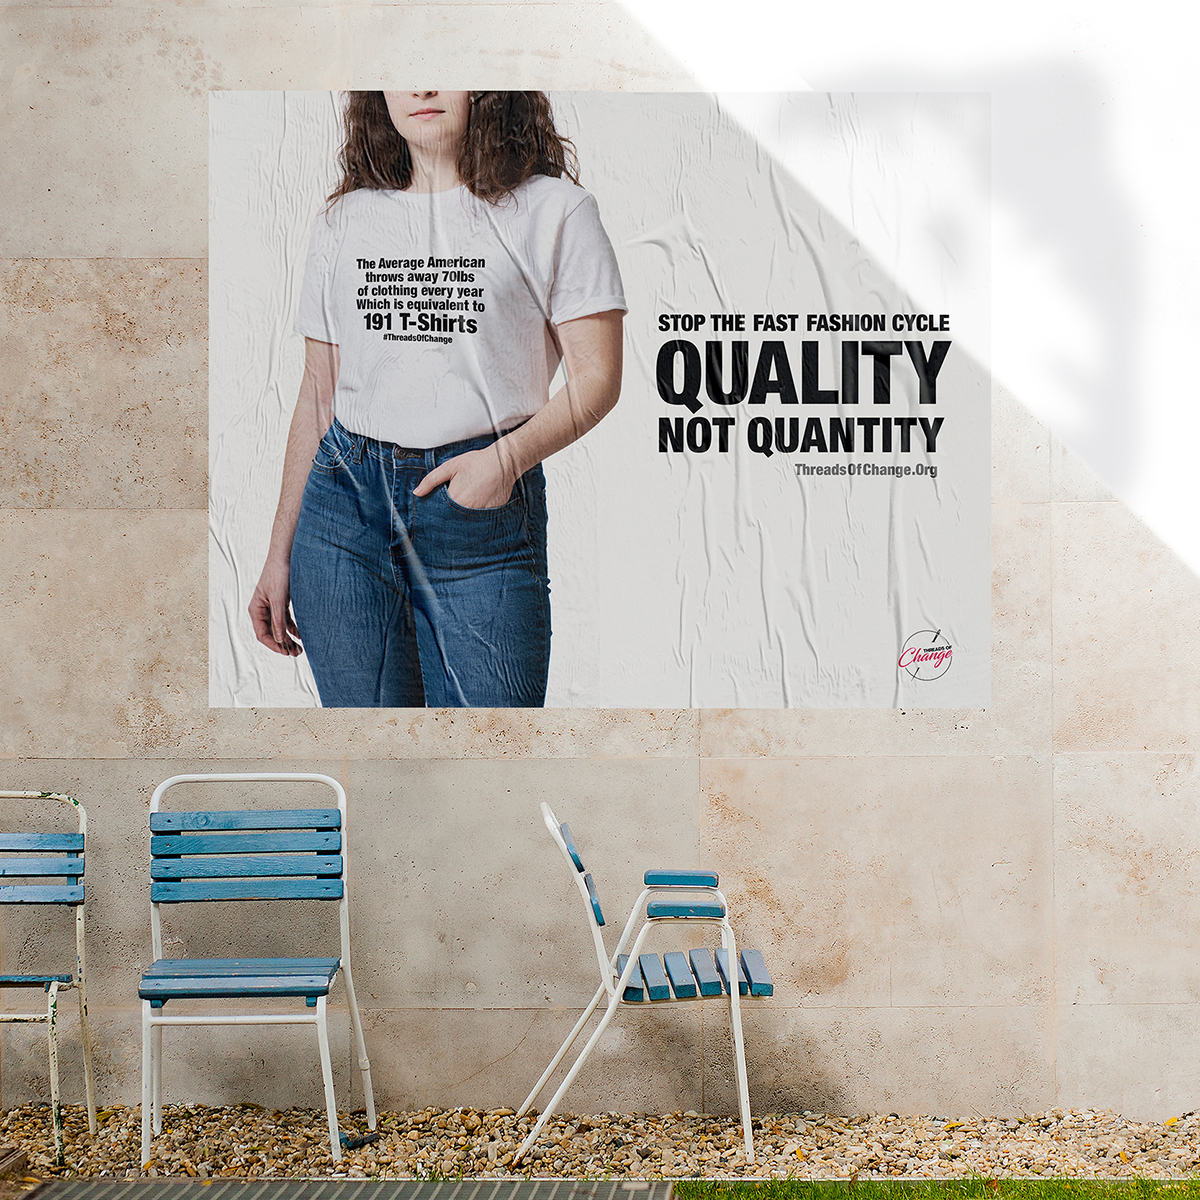 88_urban_poster_mockup_Shirt.jpg